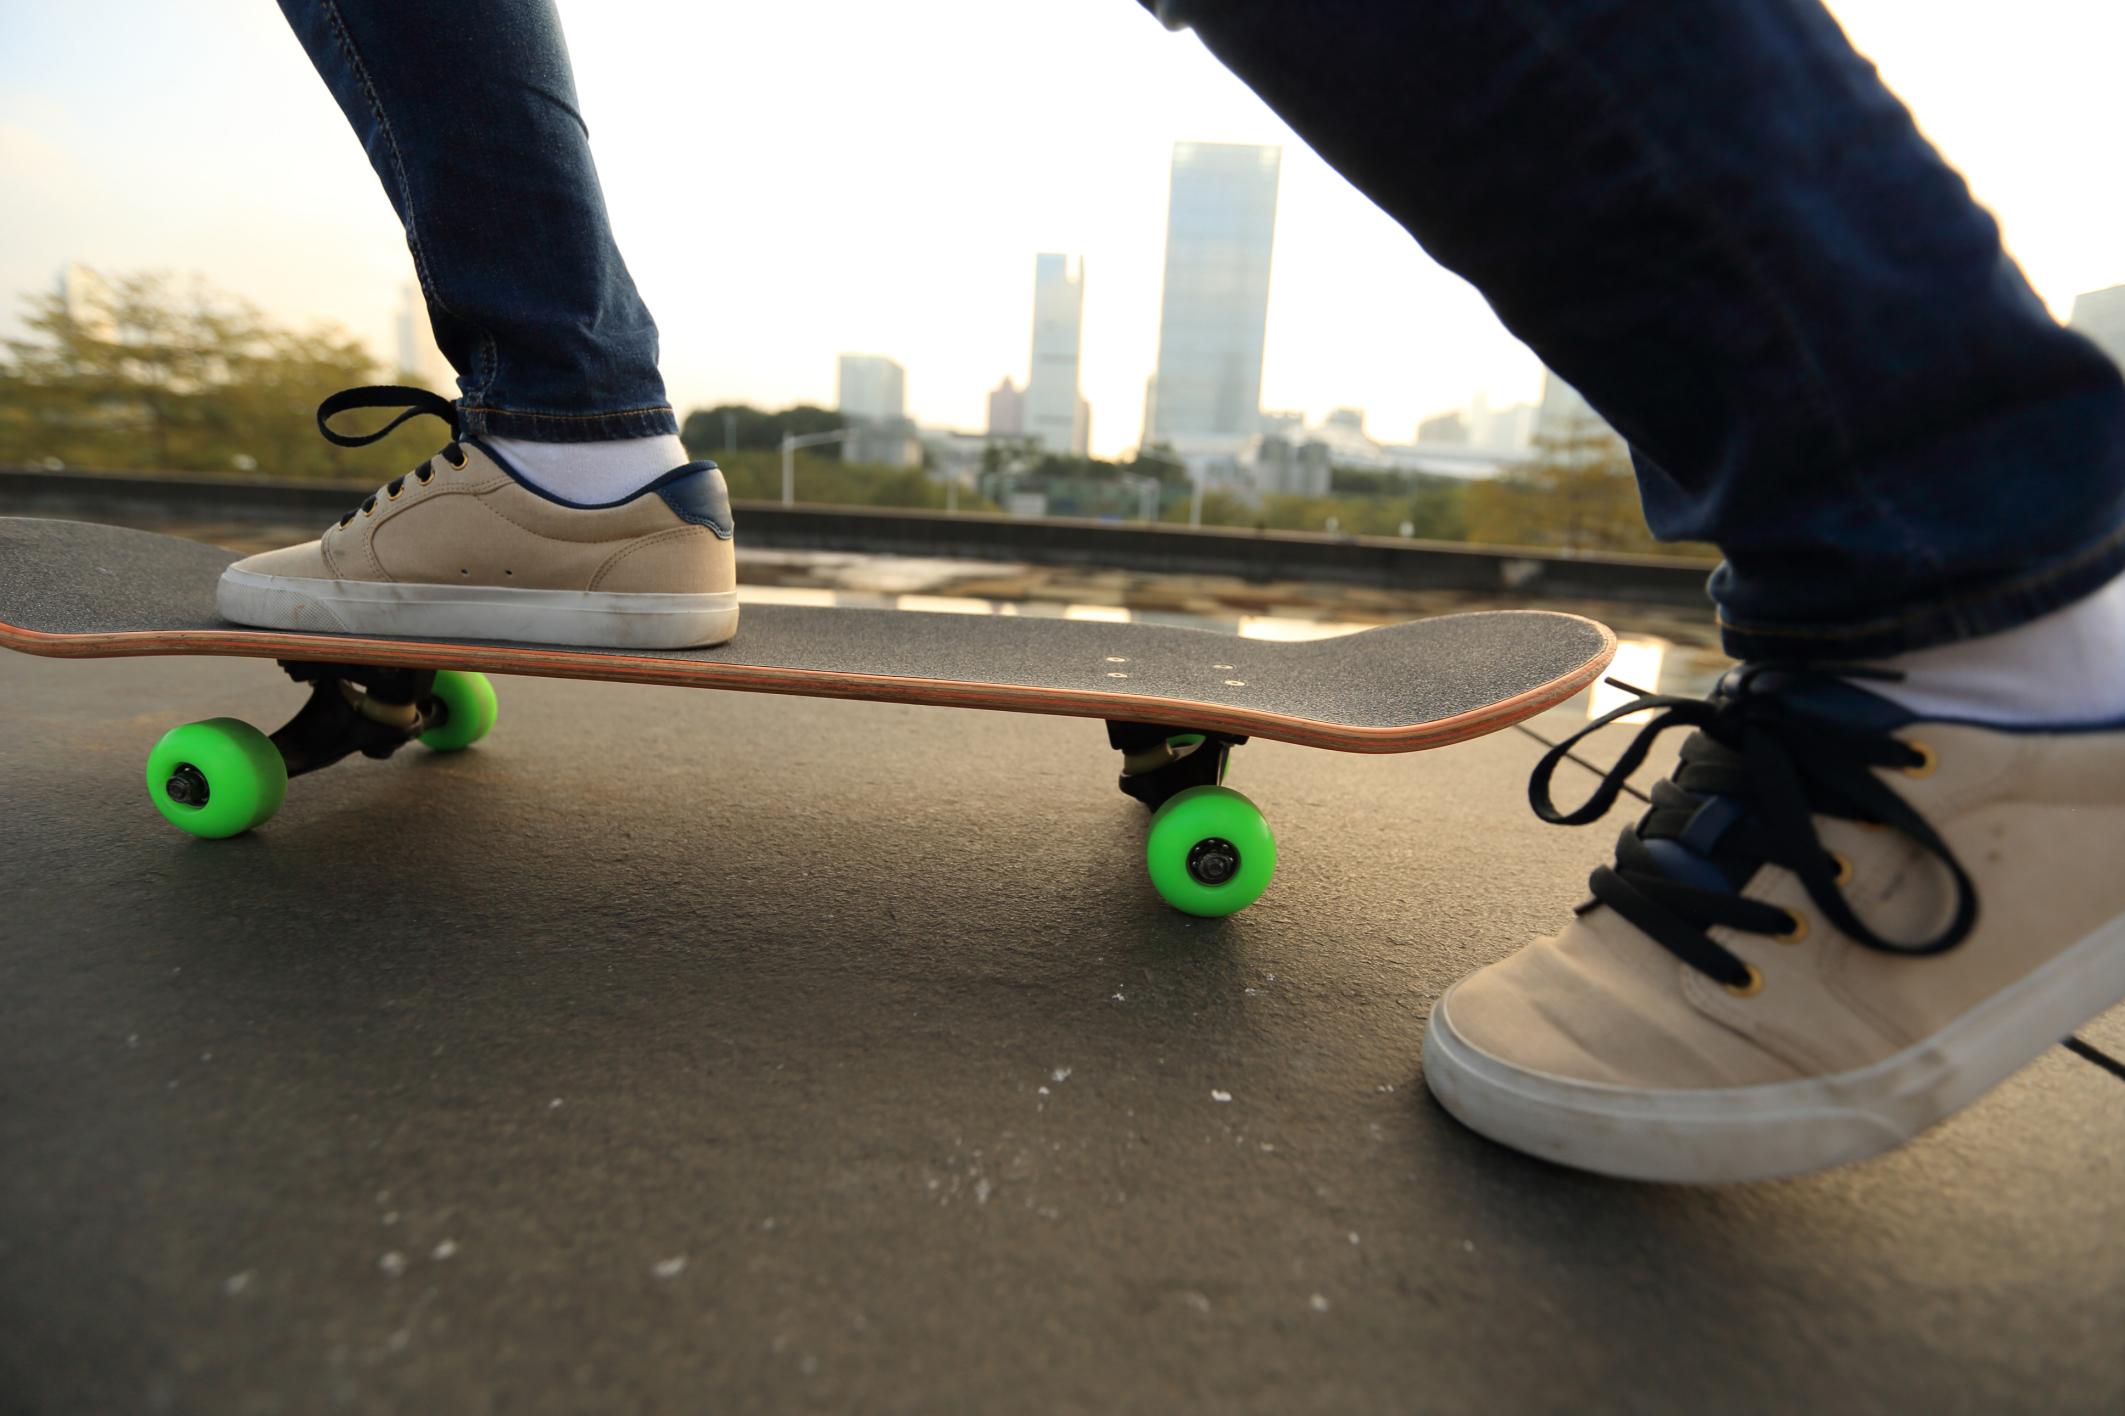 Profesor de skateboard